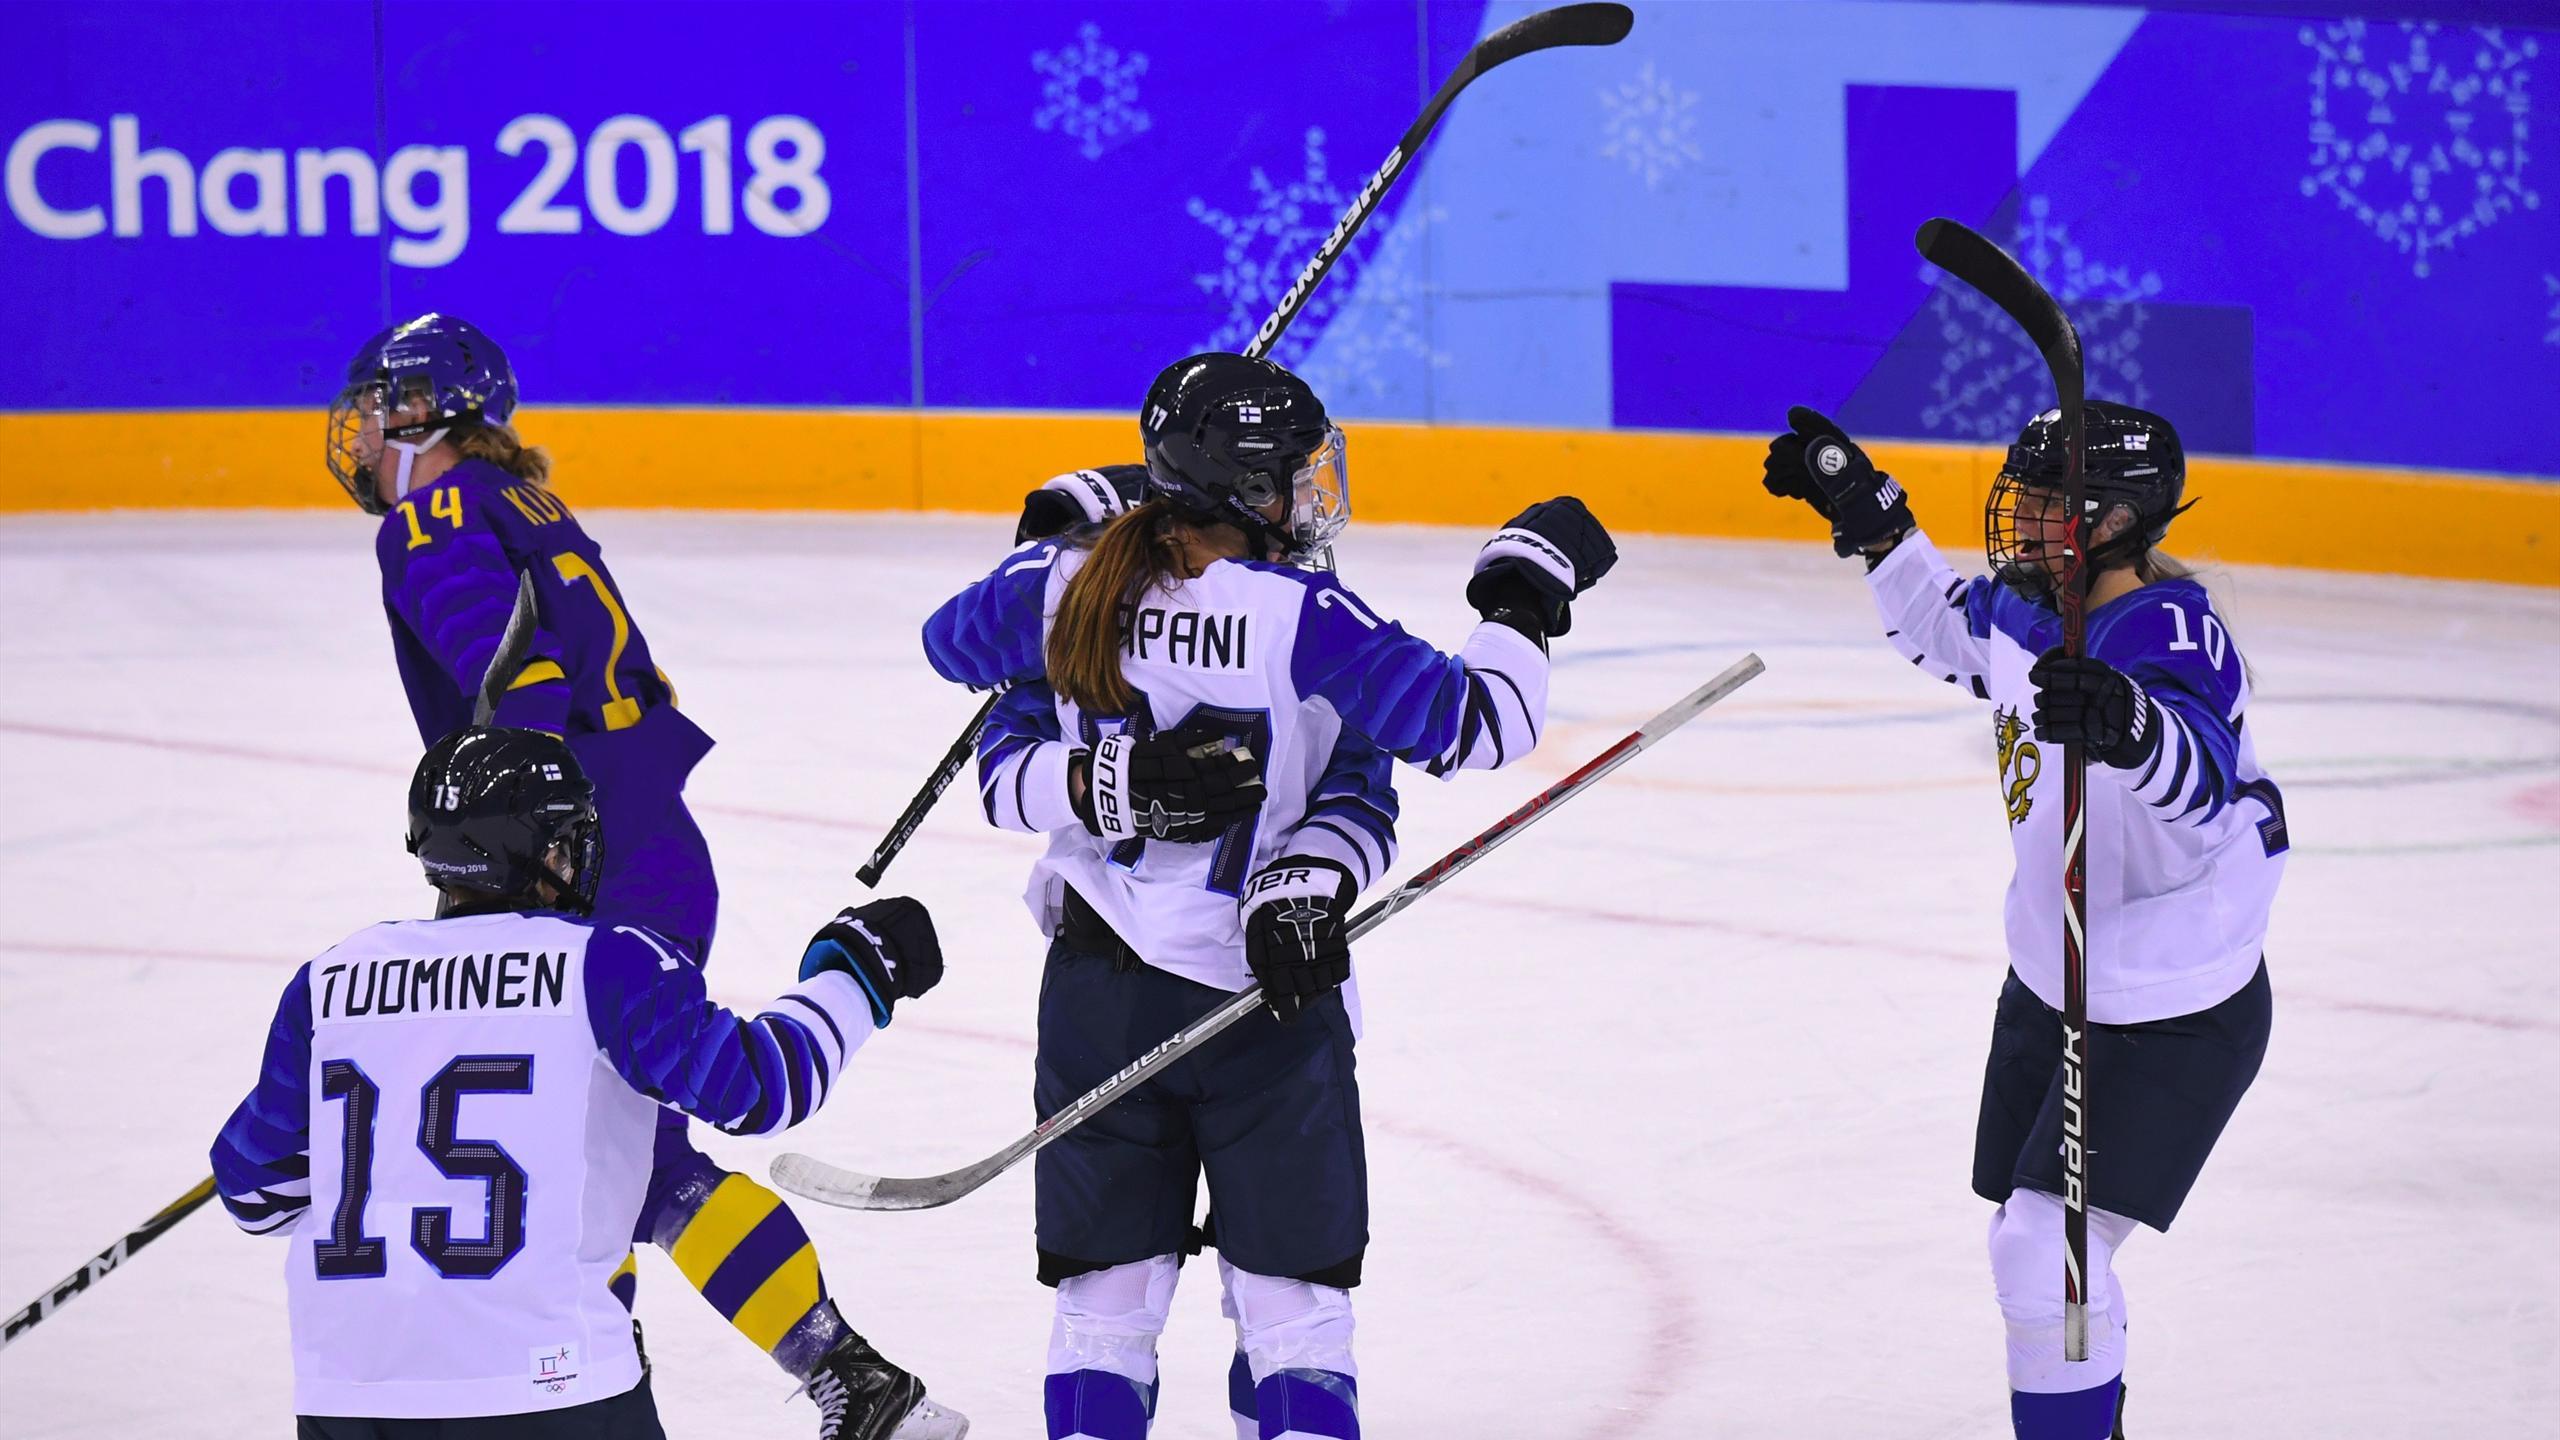 Ishockey kvartsfinal 7 av 7